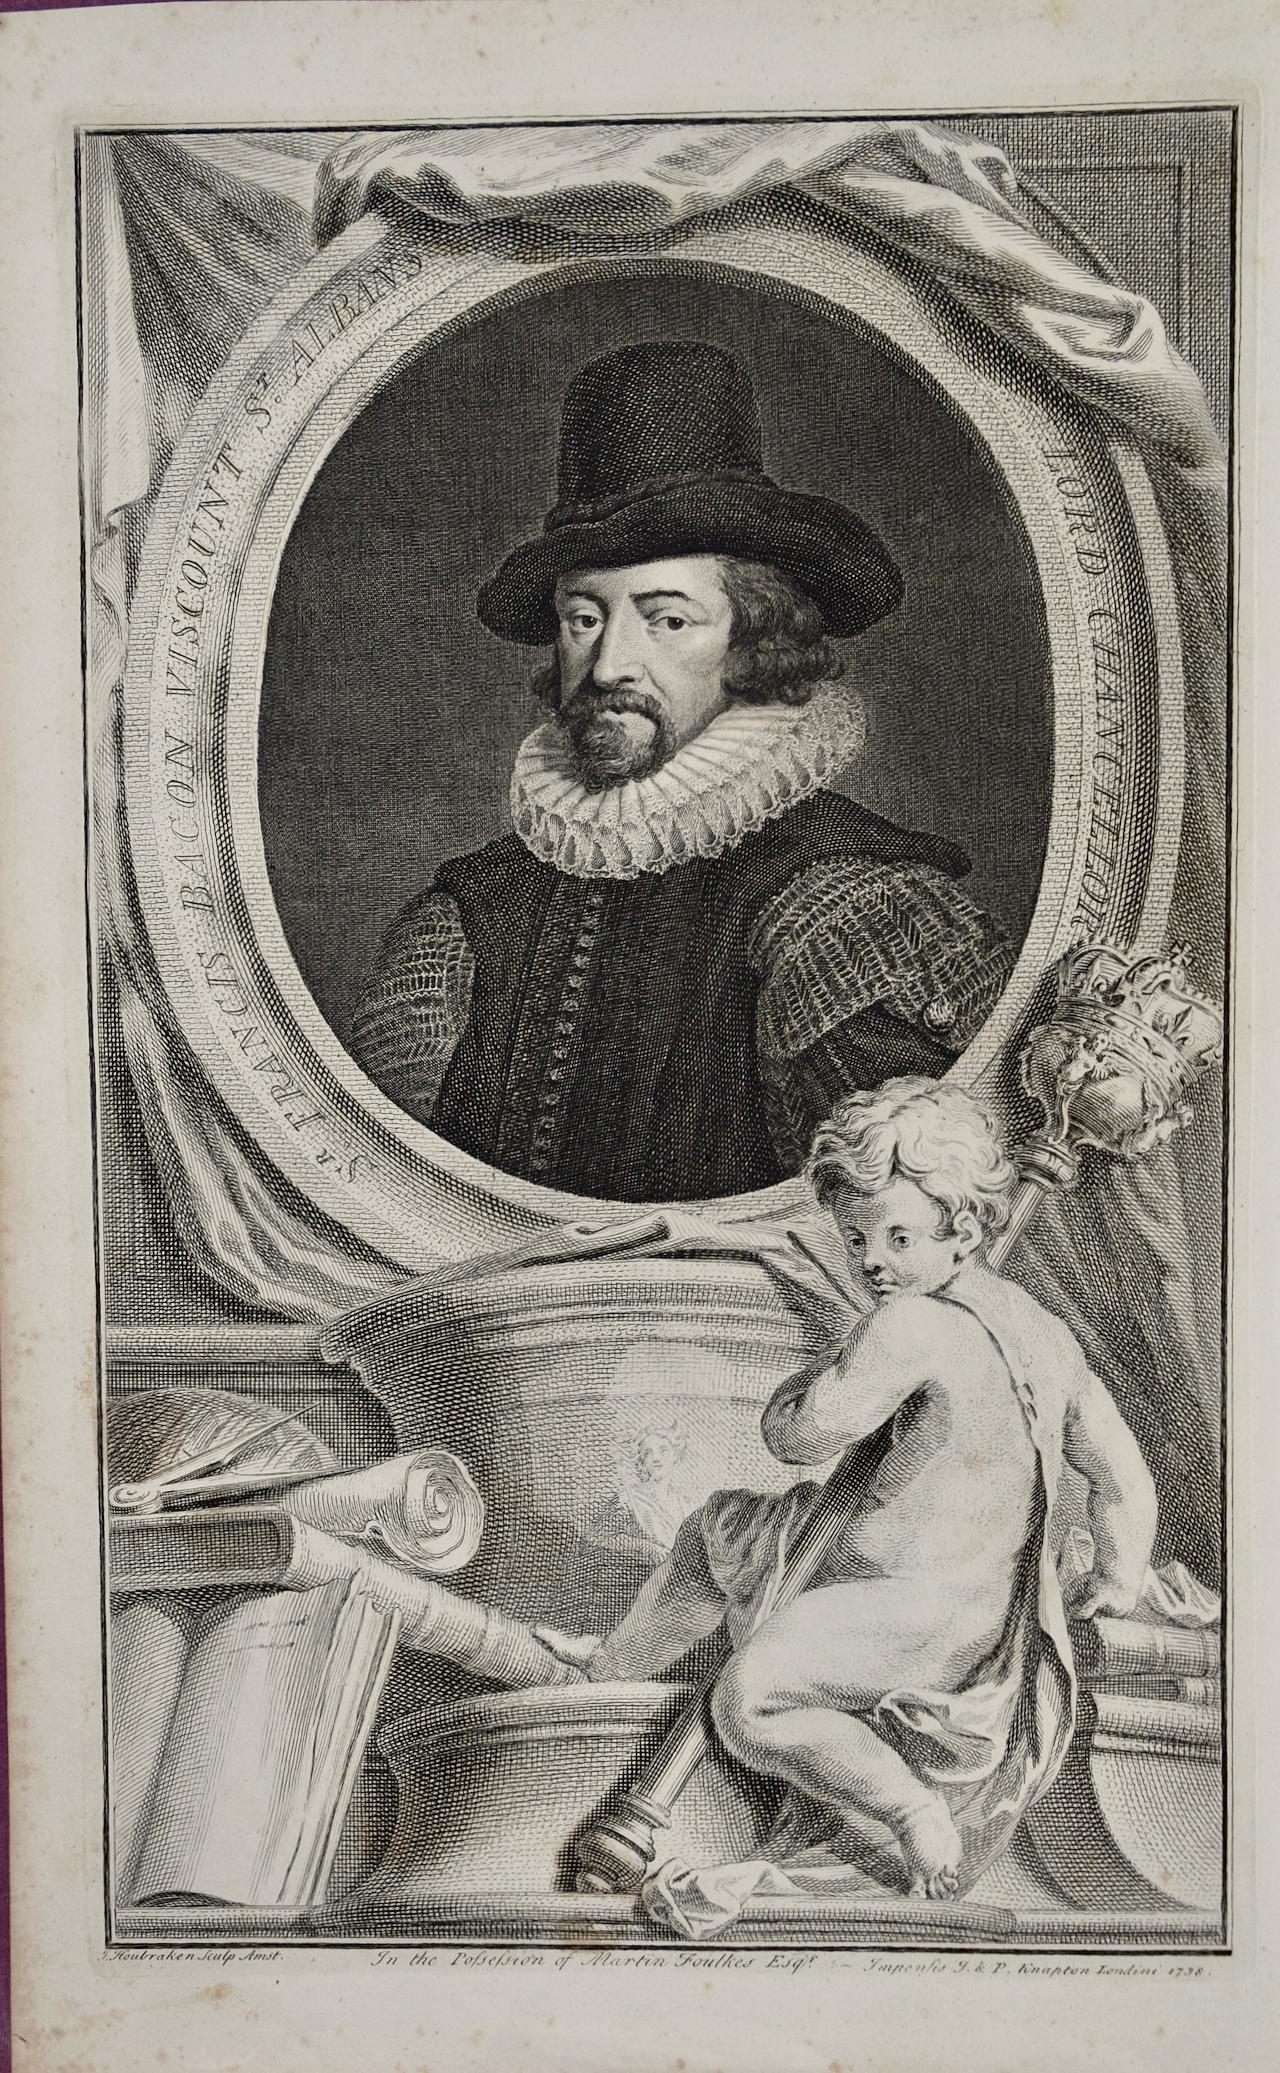 18th C. Portrait of Sir Francis Bacon: Philosopher, Scientist, Author, Statesman